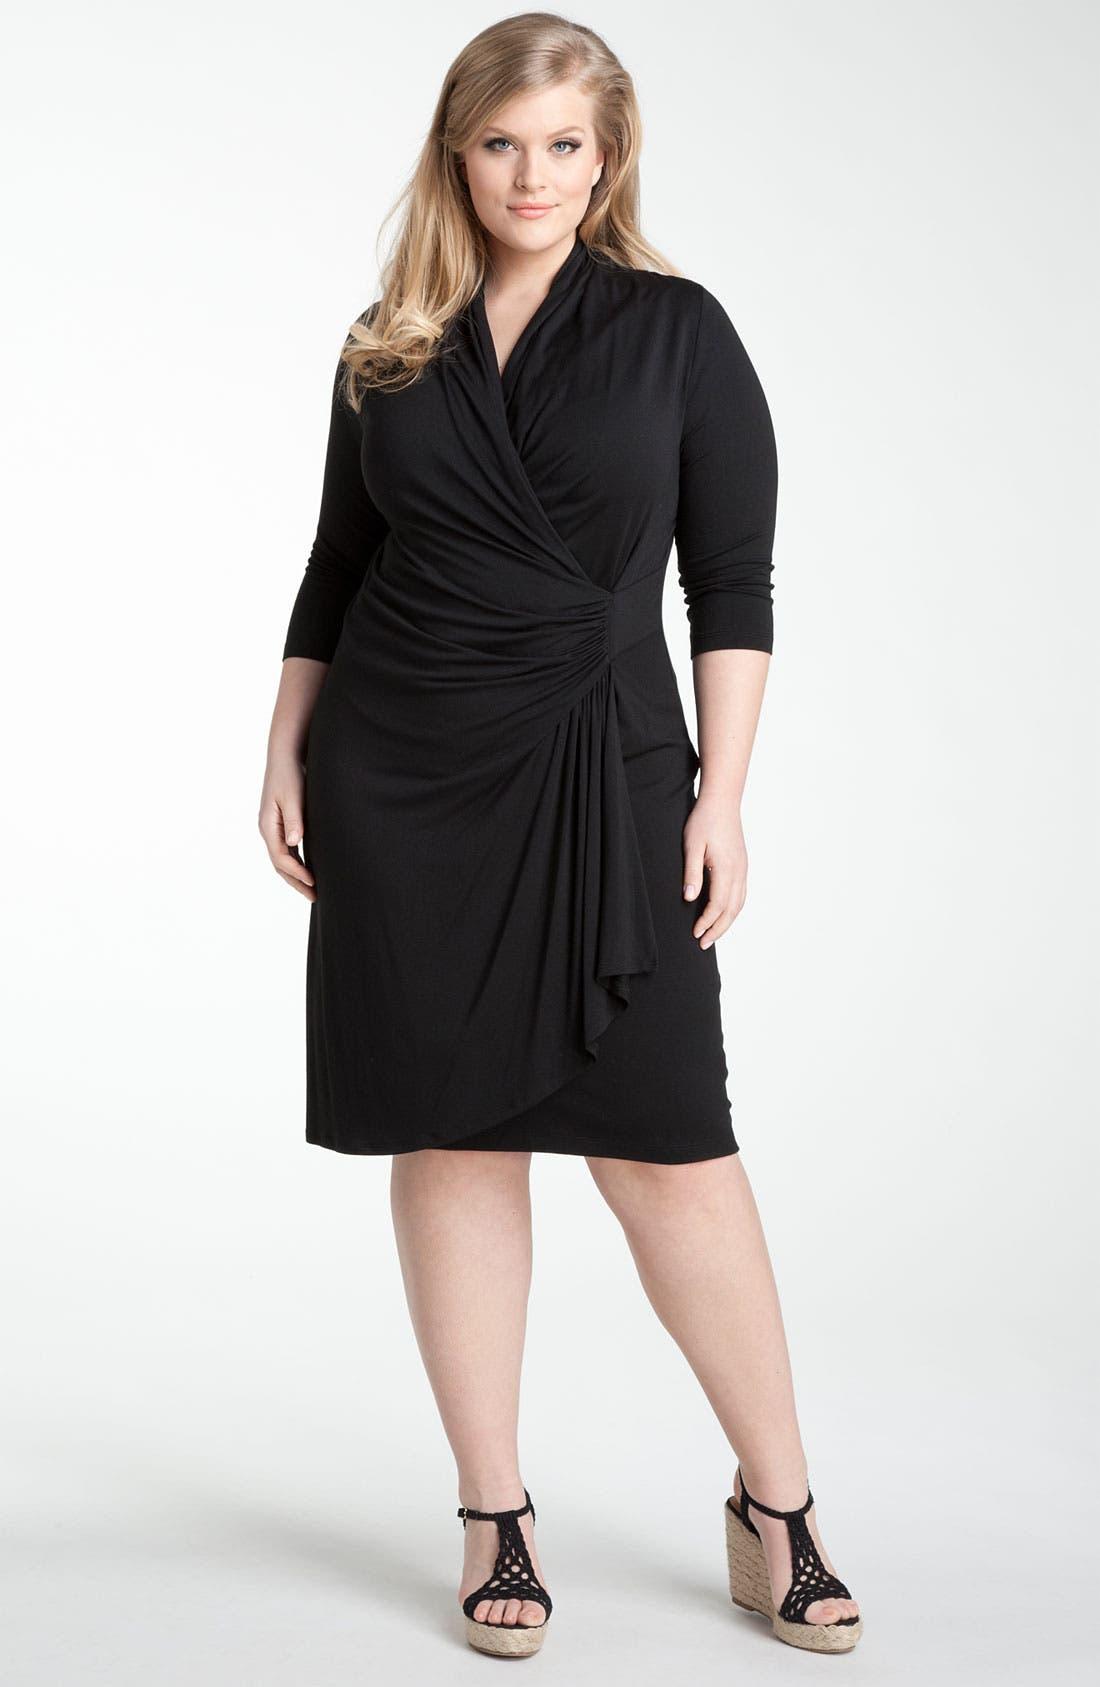 Alternate Image 1 Selected - Karen Kane 'Cascade' Faux Wrap Dress (Plus)